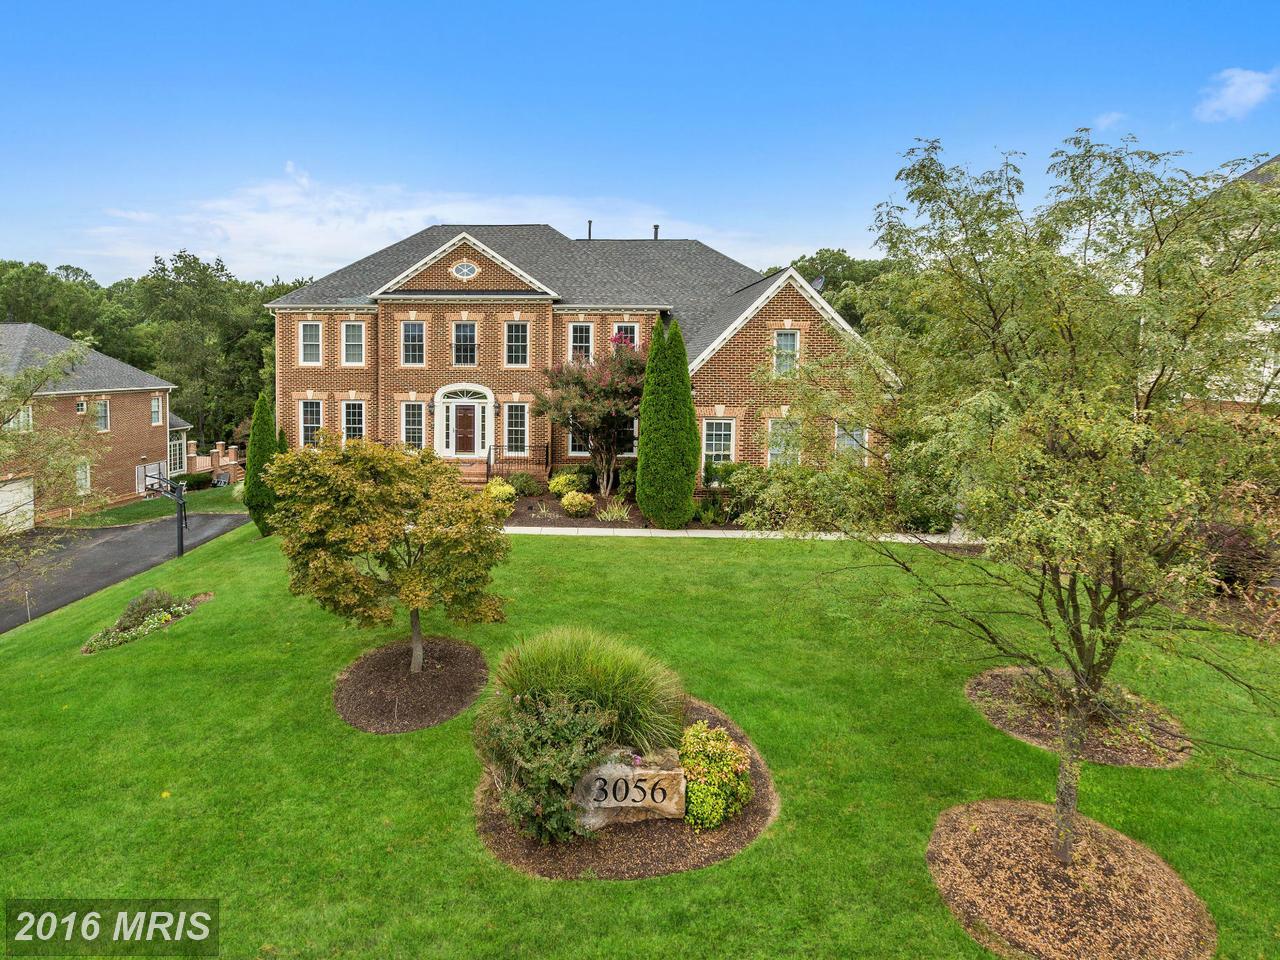 Luxury Homes For Sale In Ellicott City Md Ellicott City